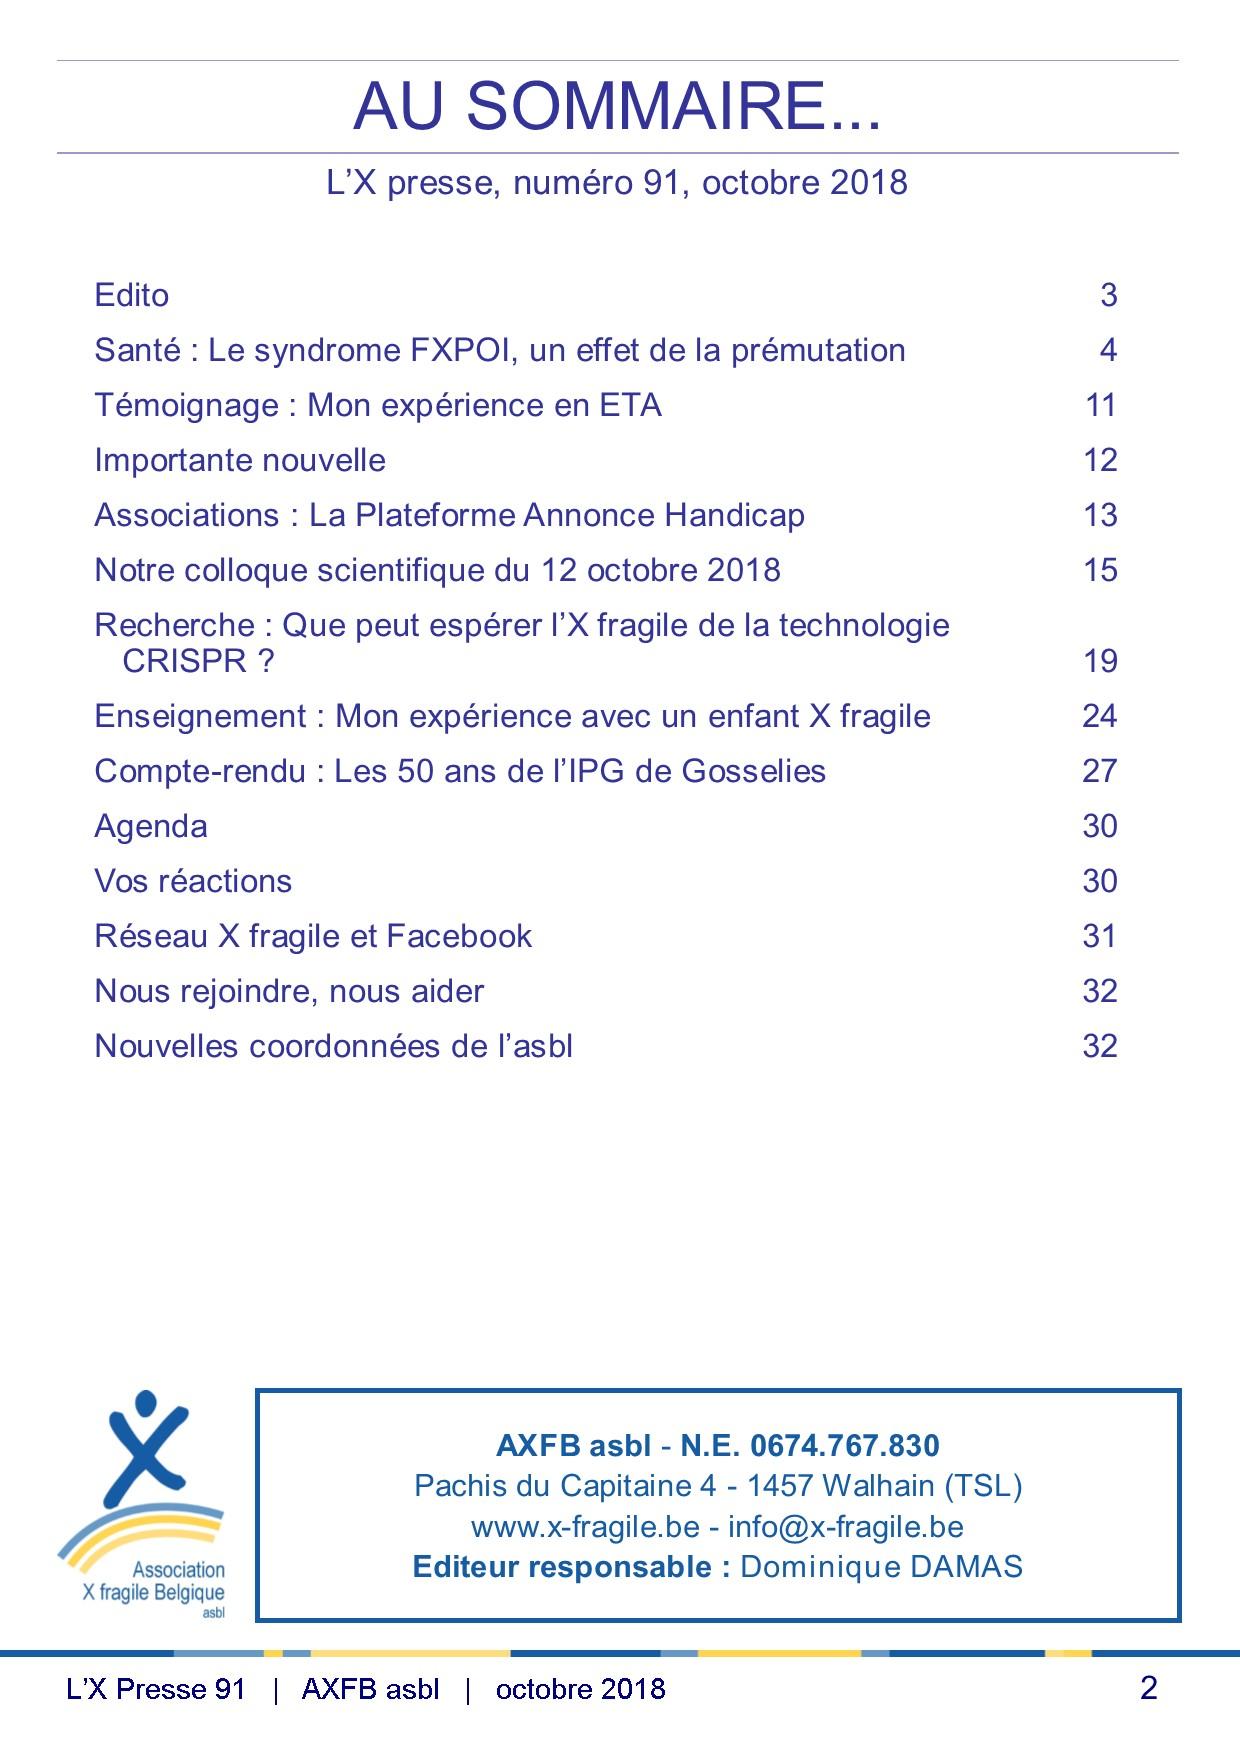 X Presse 91 - Sommaire